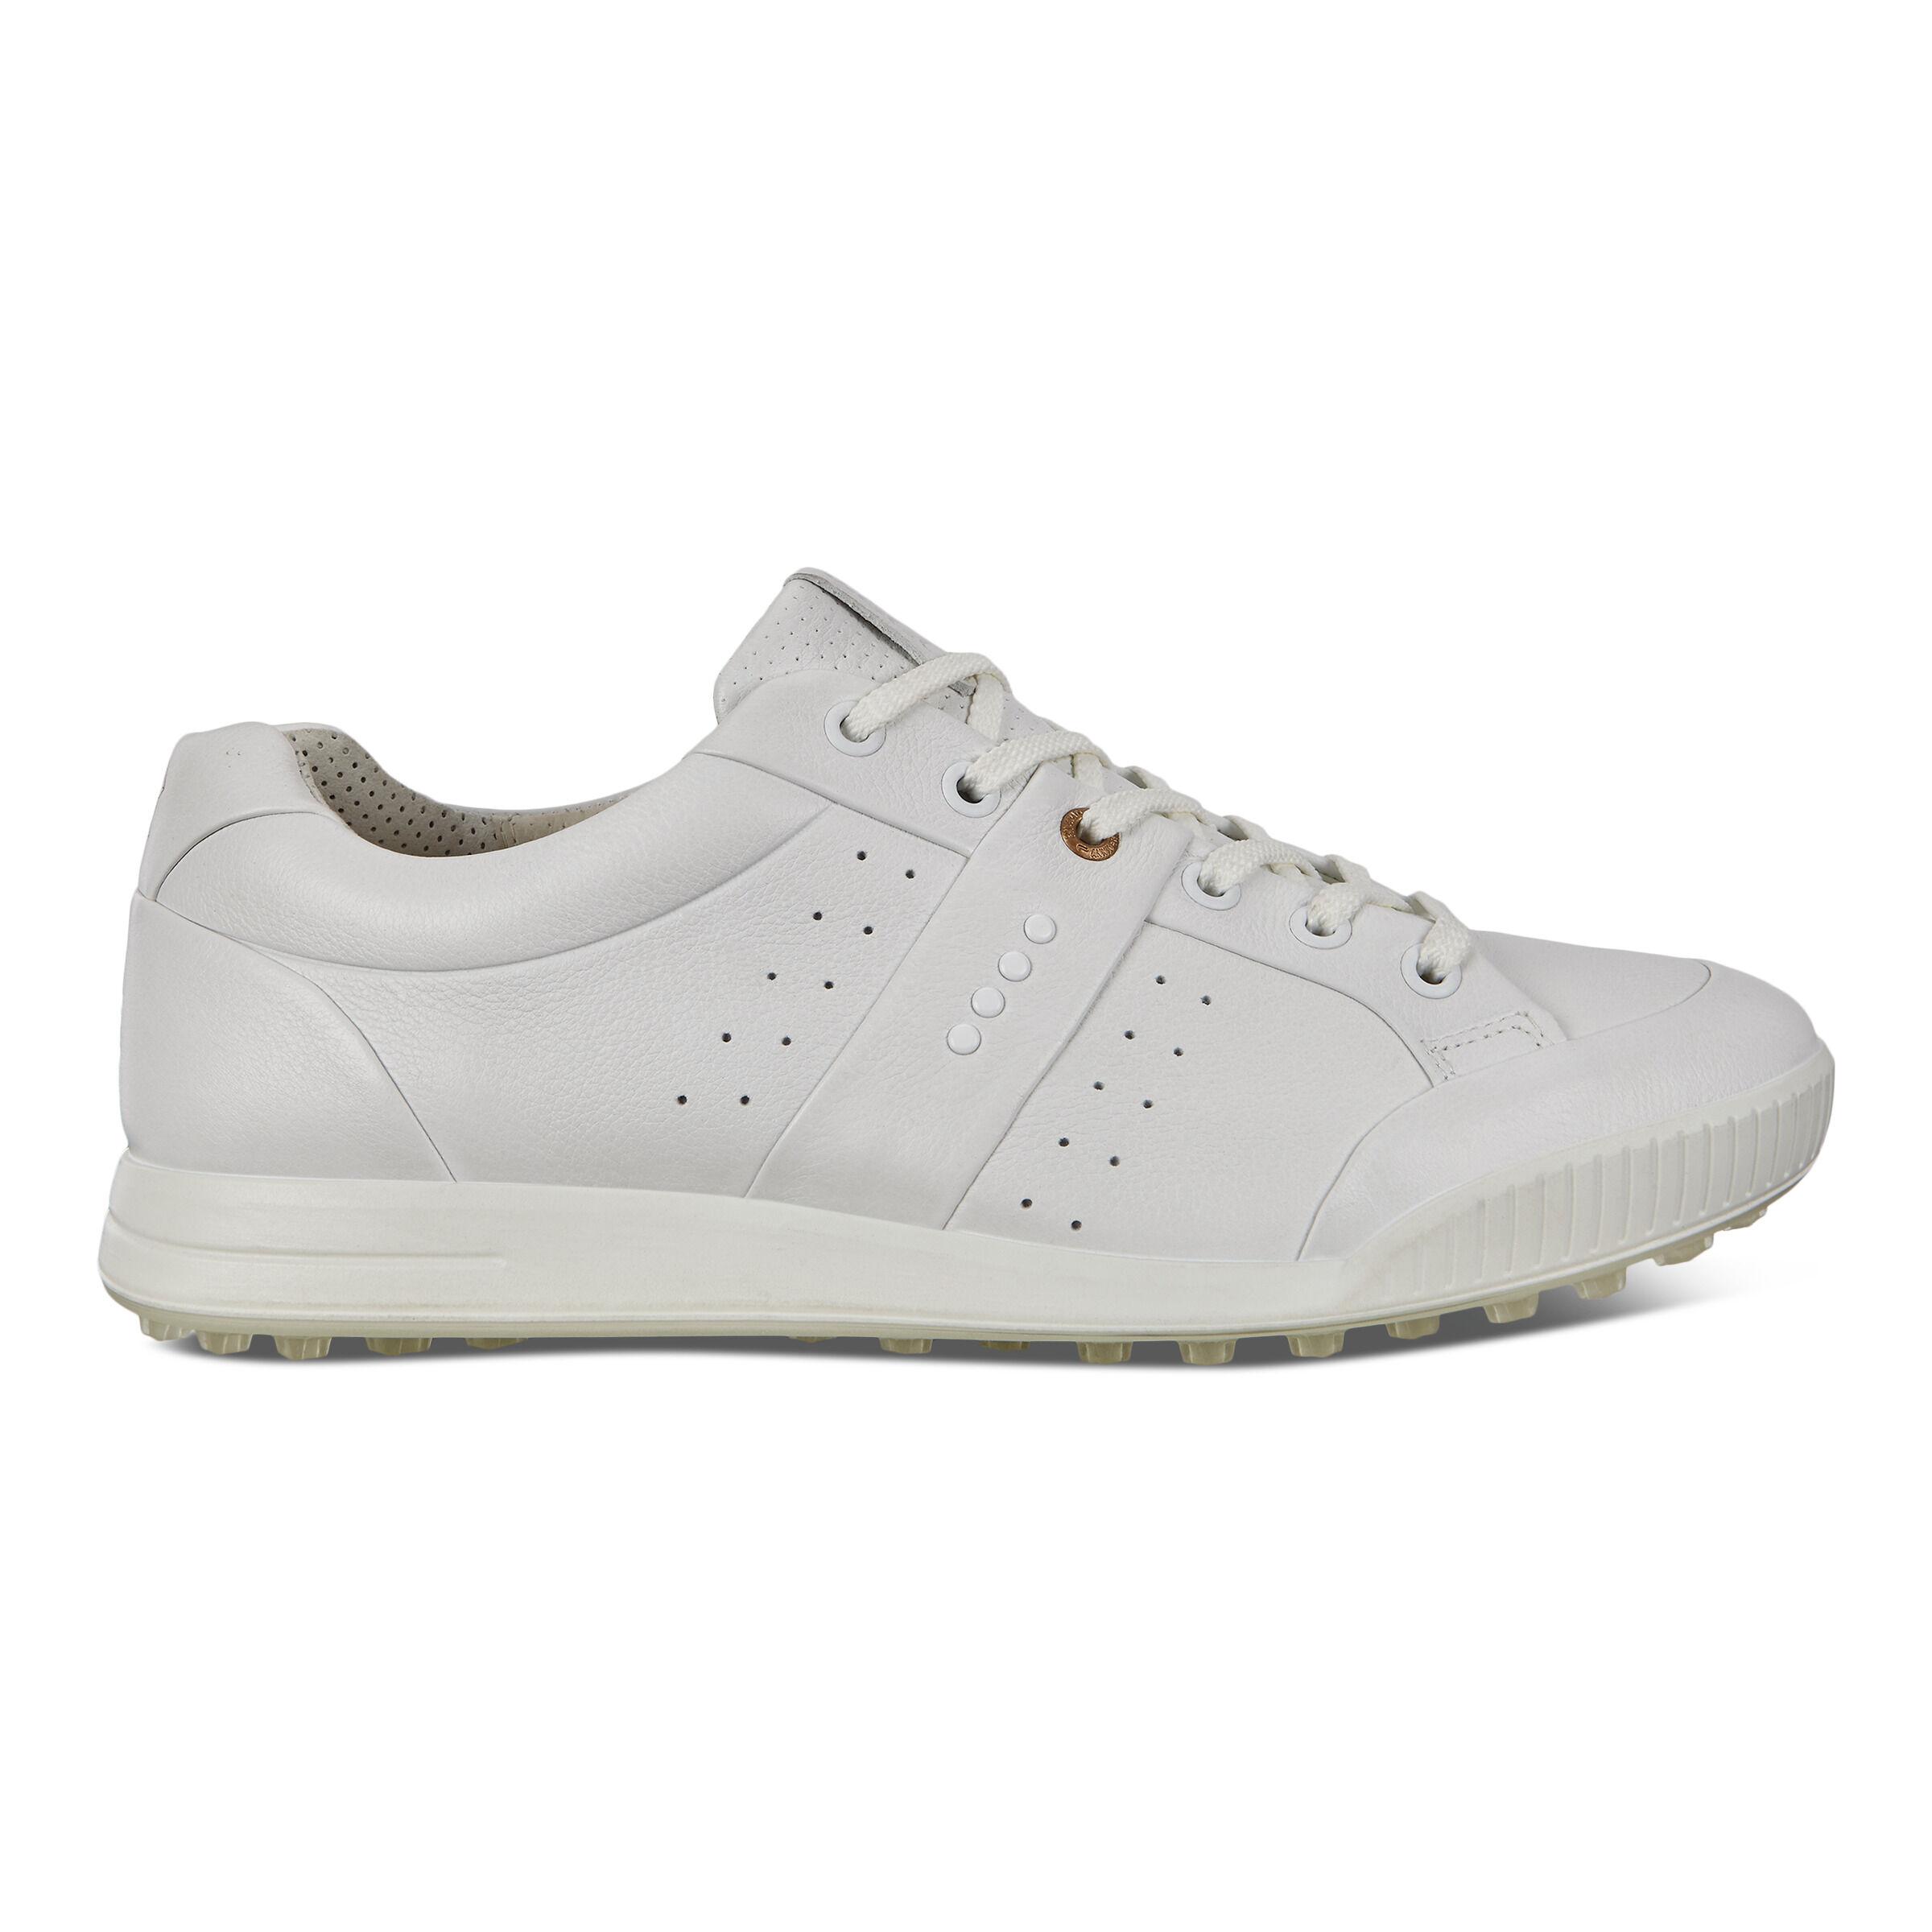 ECCO Mens Golf Street 10 Golf Shoes